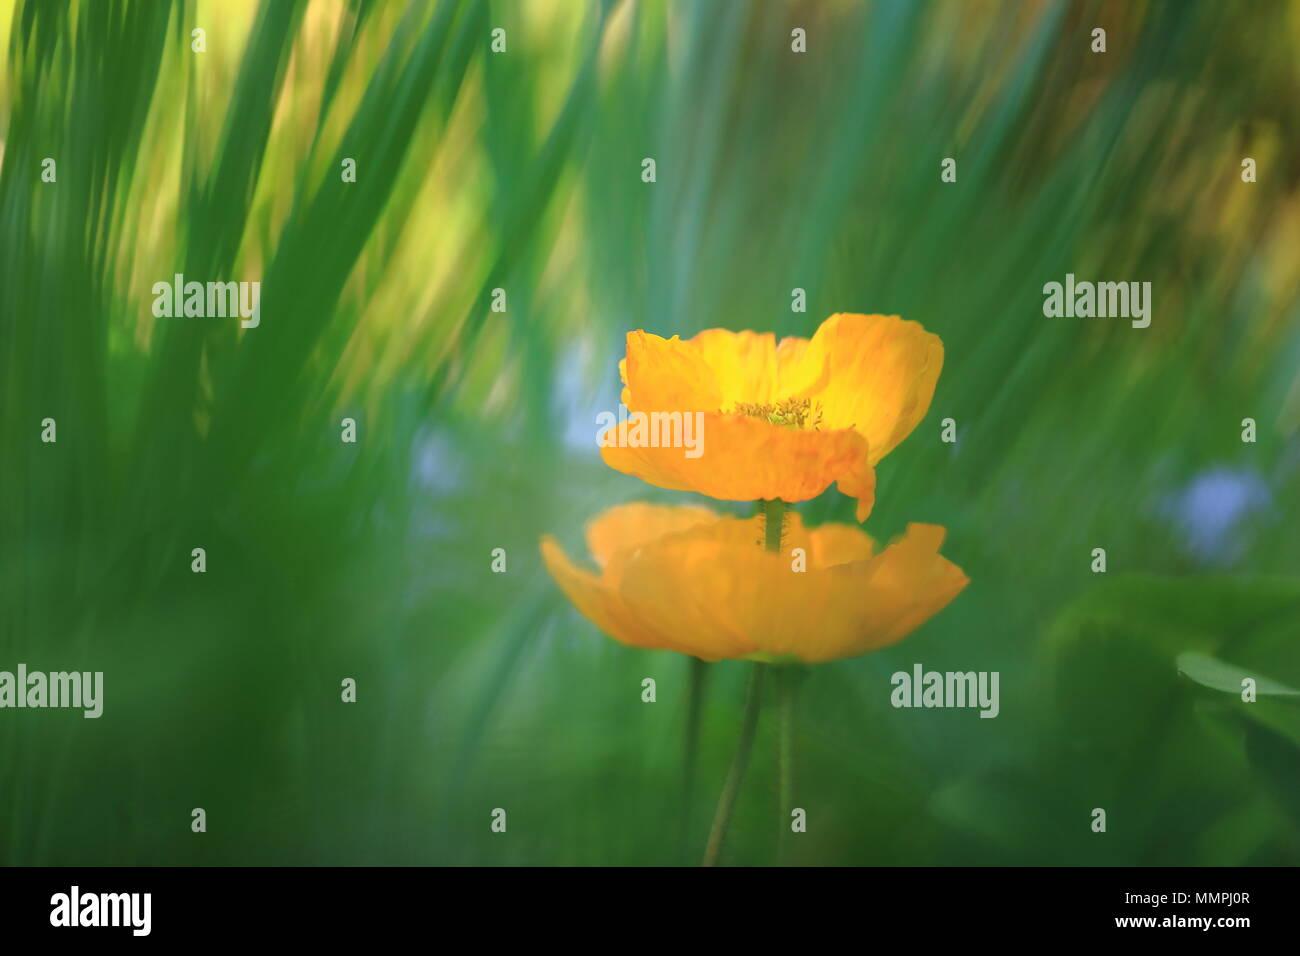 blurred view of island poppy Stock Photo